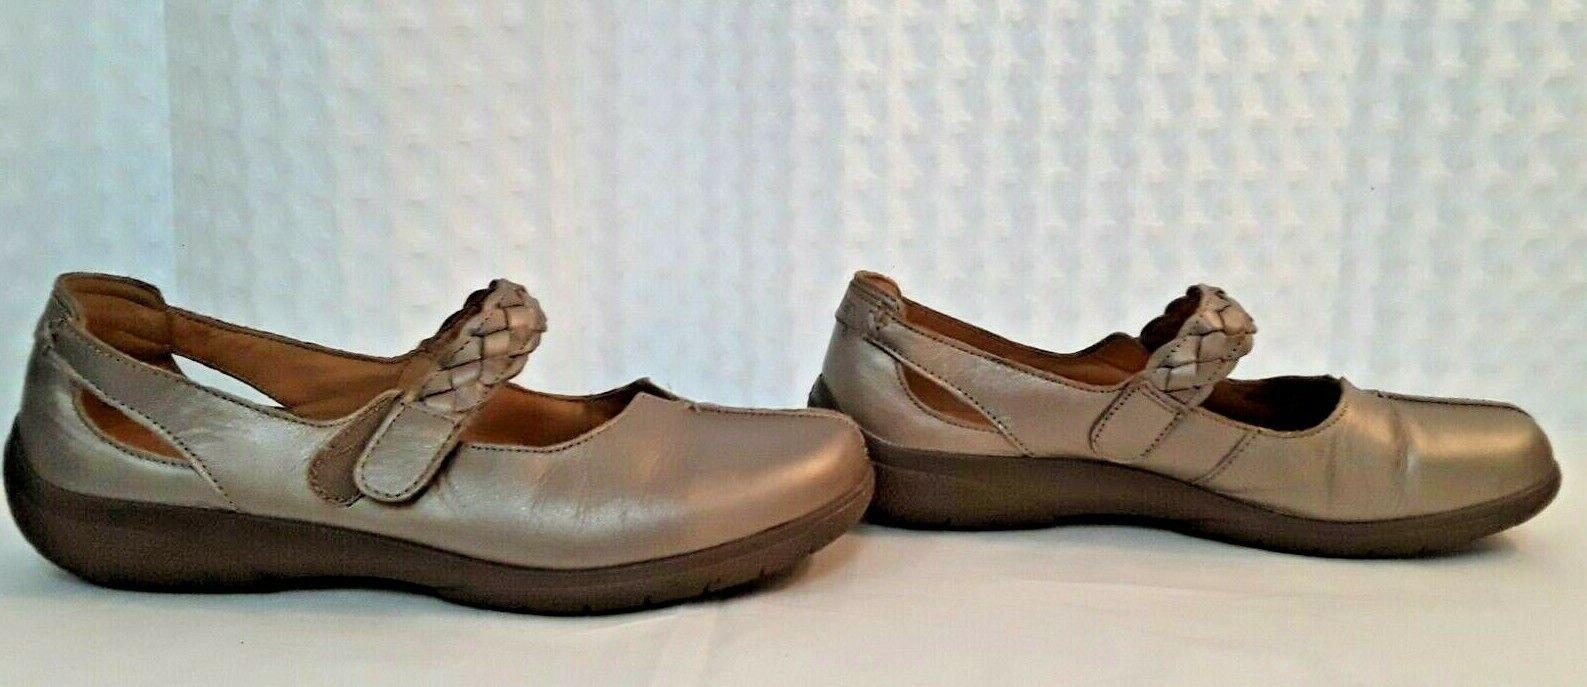 Hotter Comfort Concept Gold Leather Office Work Slip Heel Shoe Sz 9.5 Mary Janes